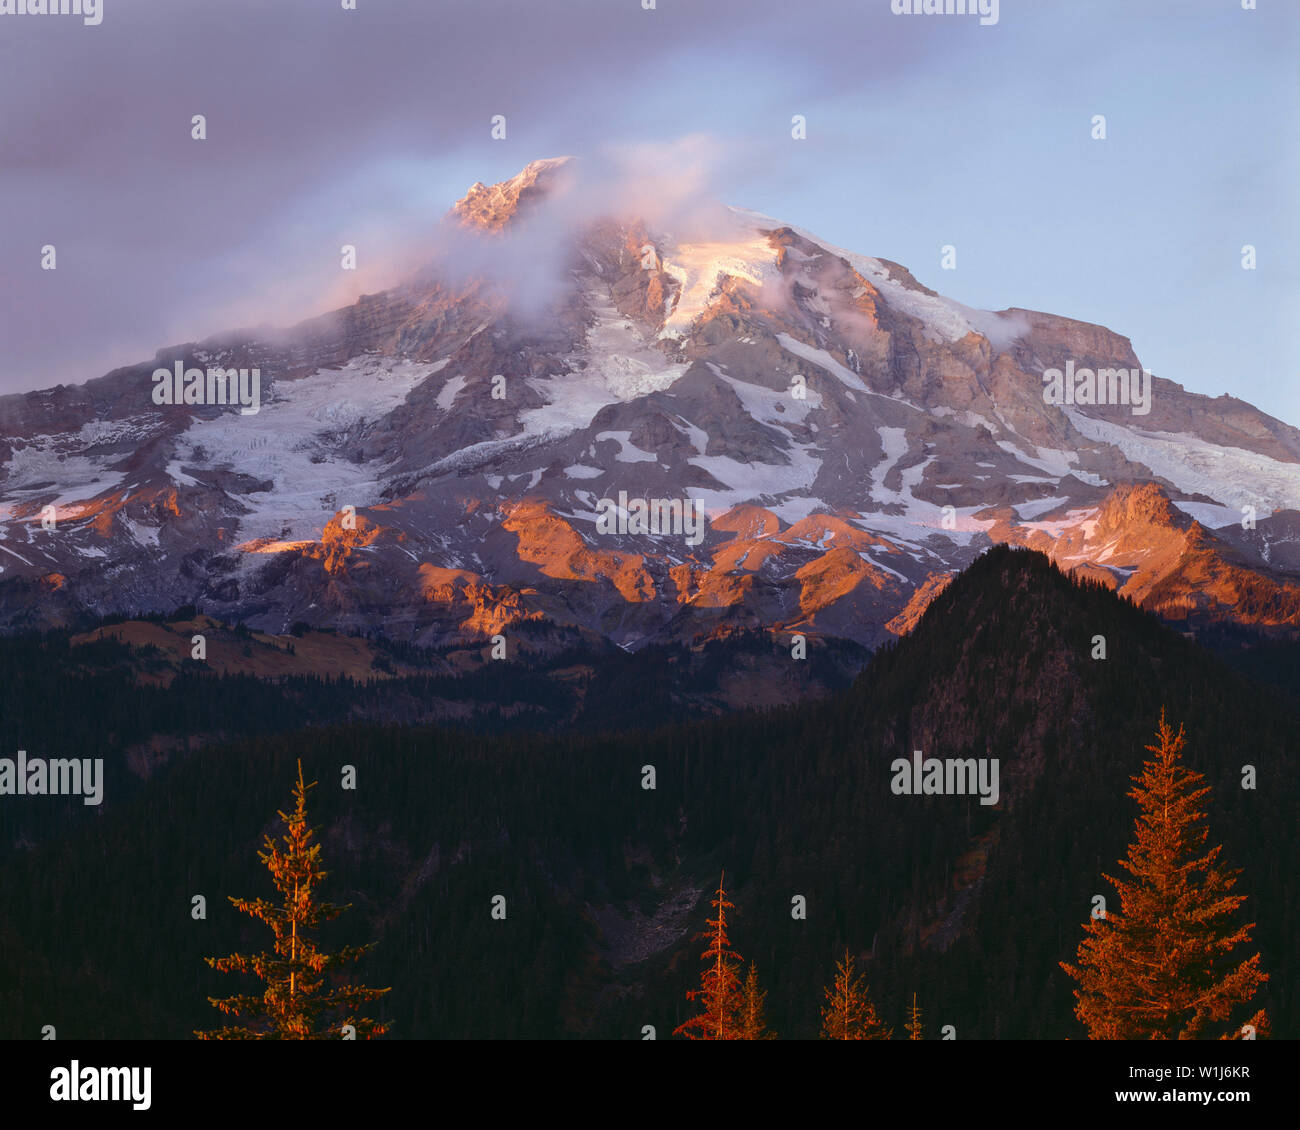 USA, Washington, Mt. Rainier National Park, Sunset light reddens southern slopes of Mount Rainier and conifer trees. - Stock Image